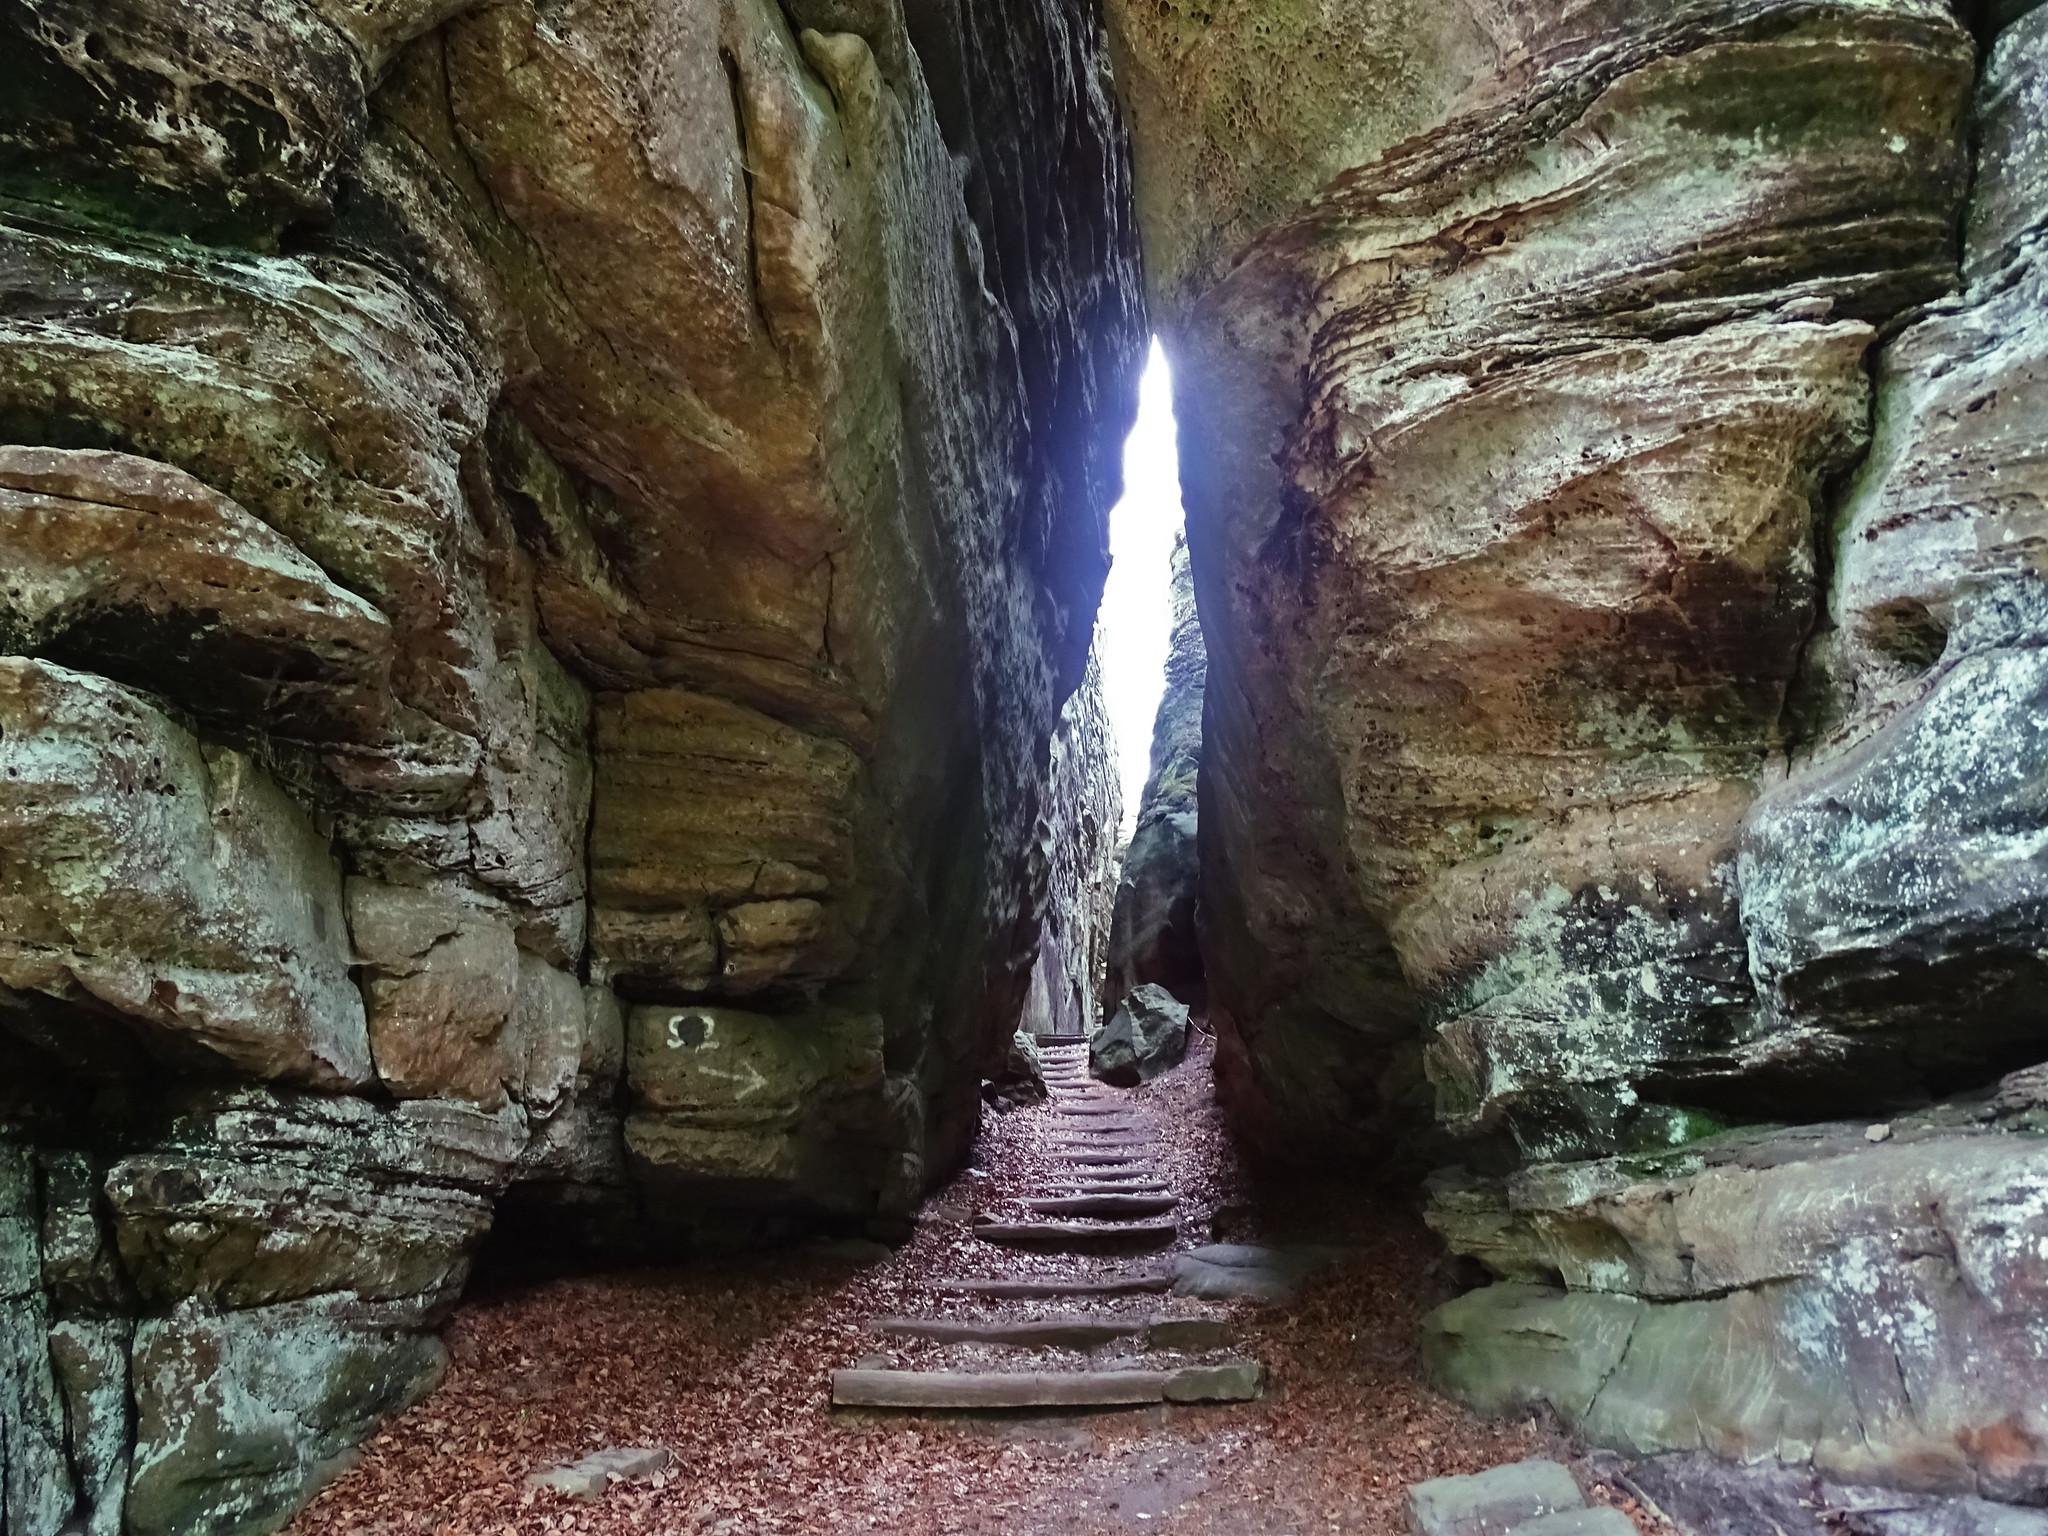 formacion rocosa Geopark Mellerdall o Mullerthal Luxemburgo